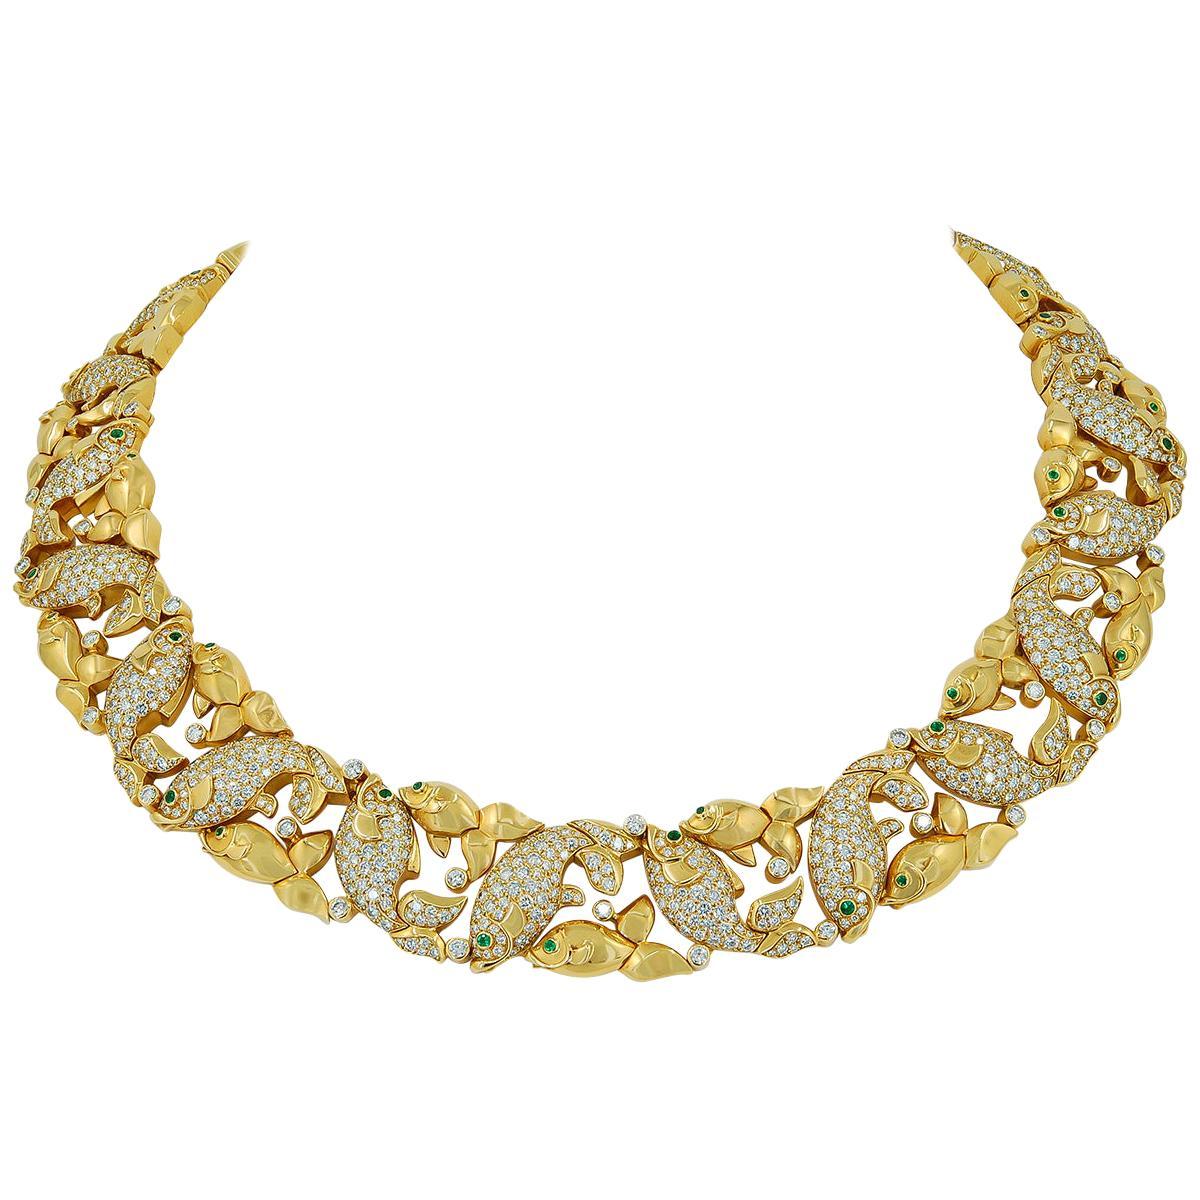 Cartier Diamond Emerald Goldfish Motif Necklace